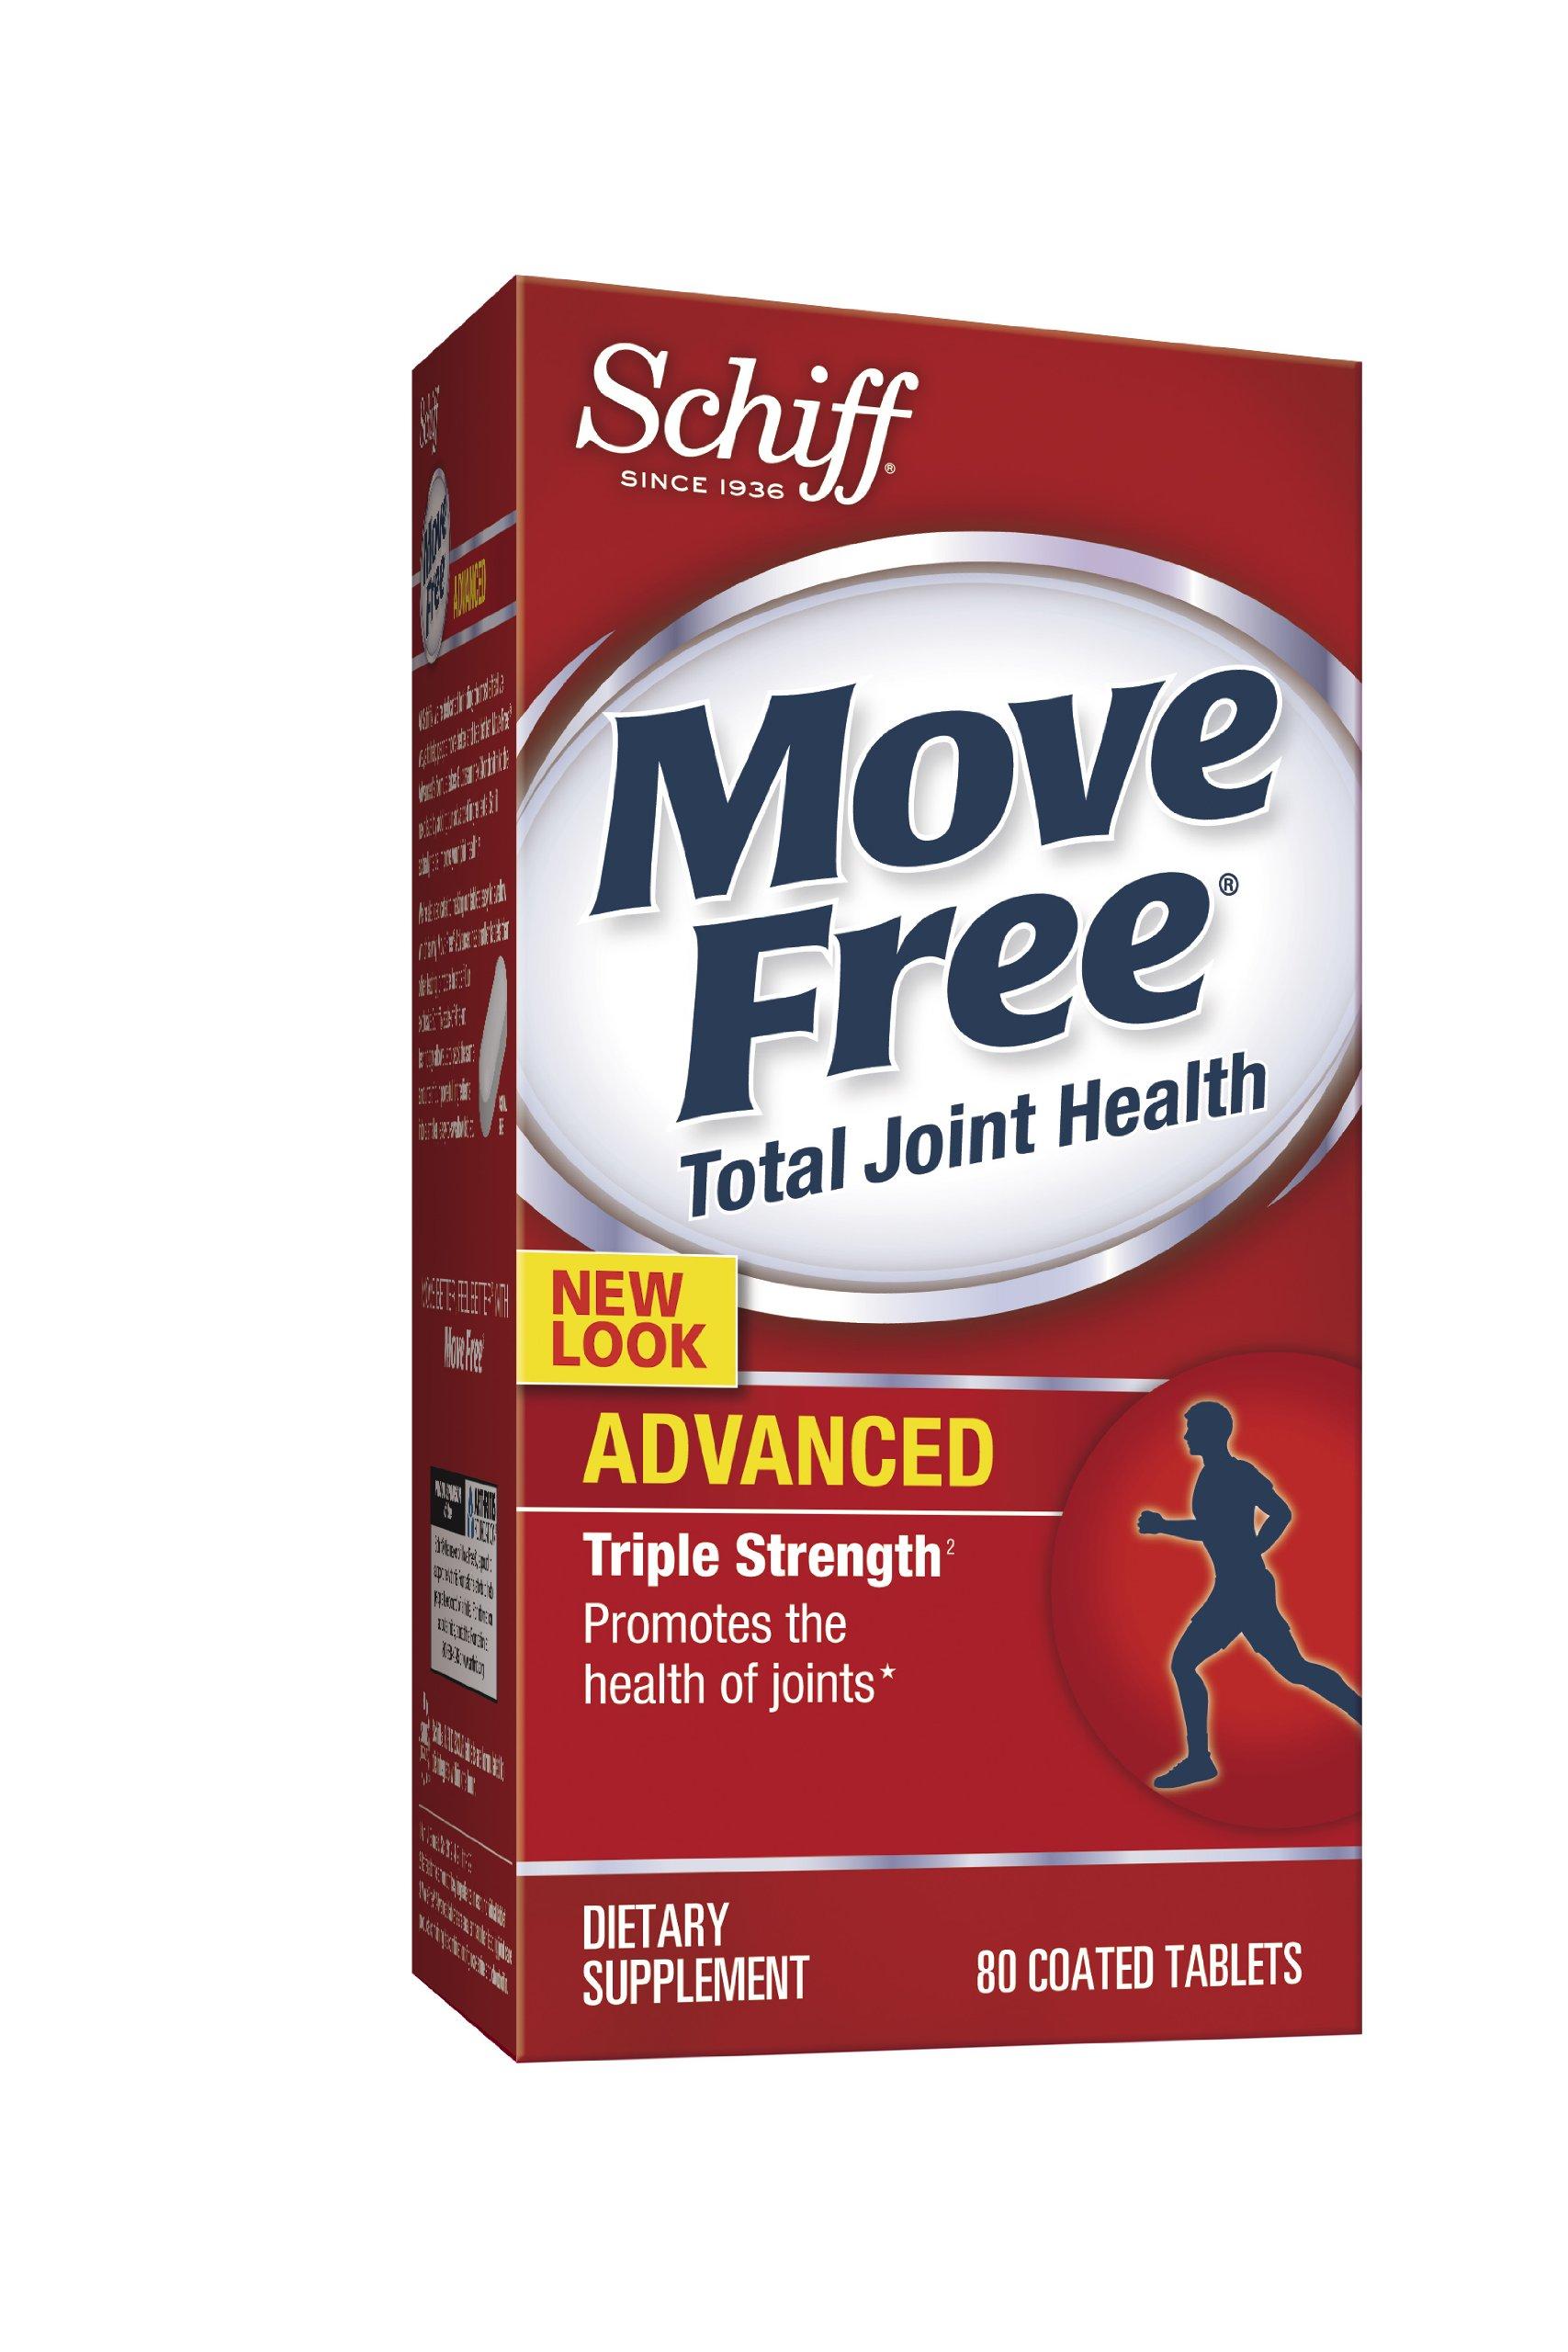 Schiff Move Free 美国直邮红瓶盒维骨力 80粒一瓶 一天两粒 四十天量 红瓶一站式海淘,海淘花专业海外代购网站--进口 海淘 正品 转运 价格